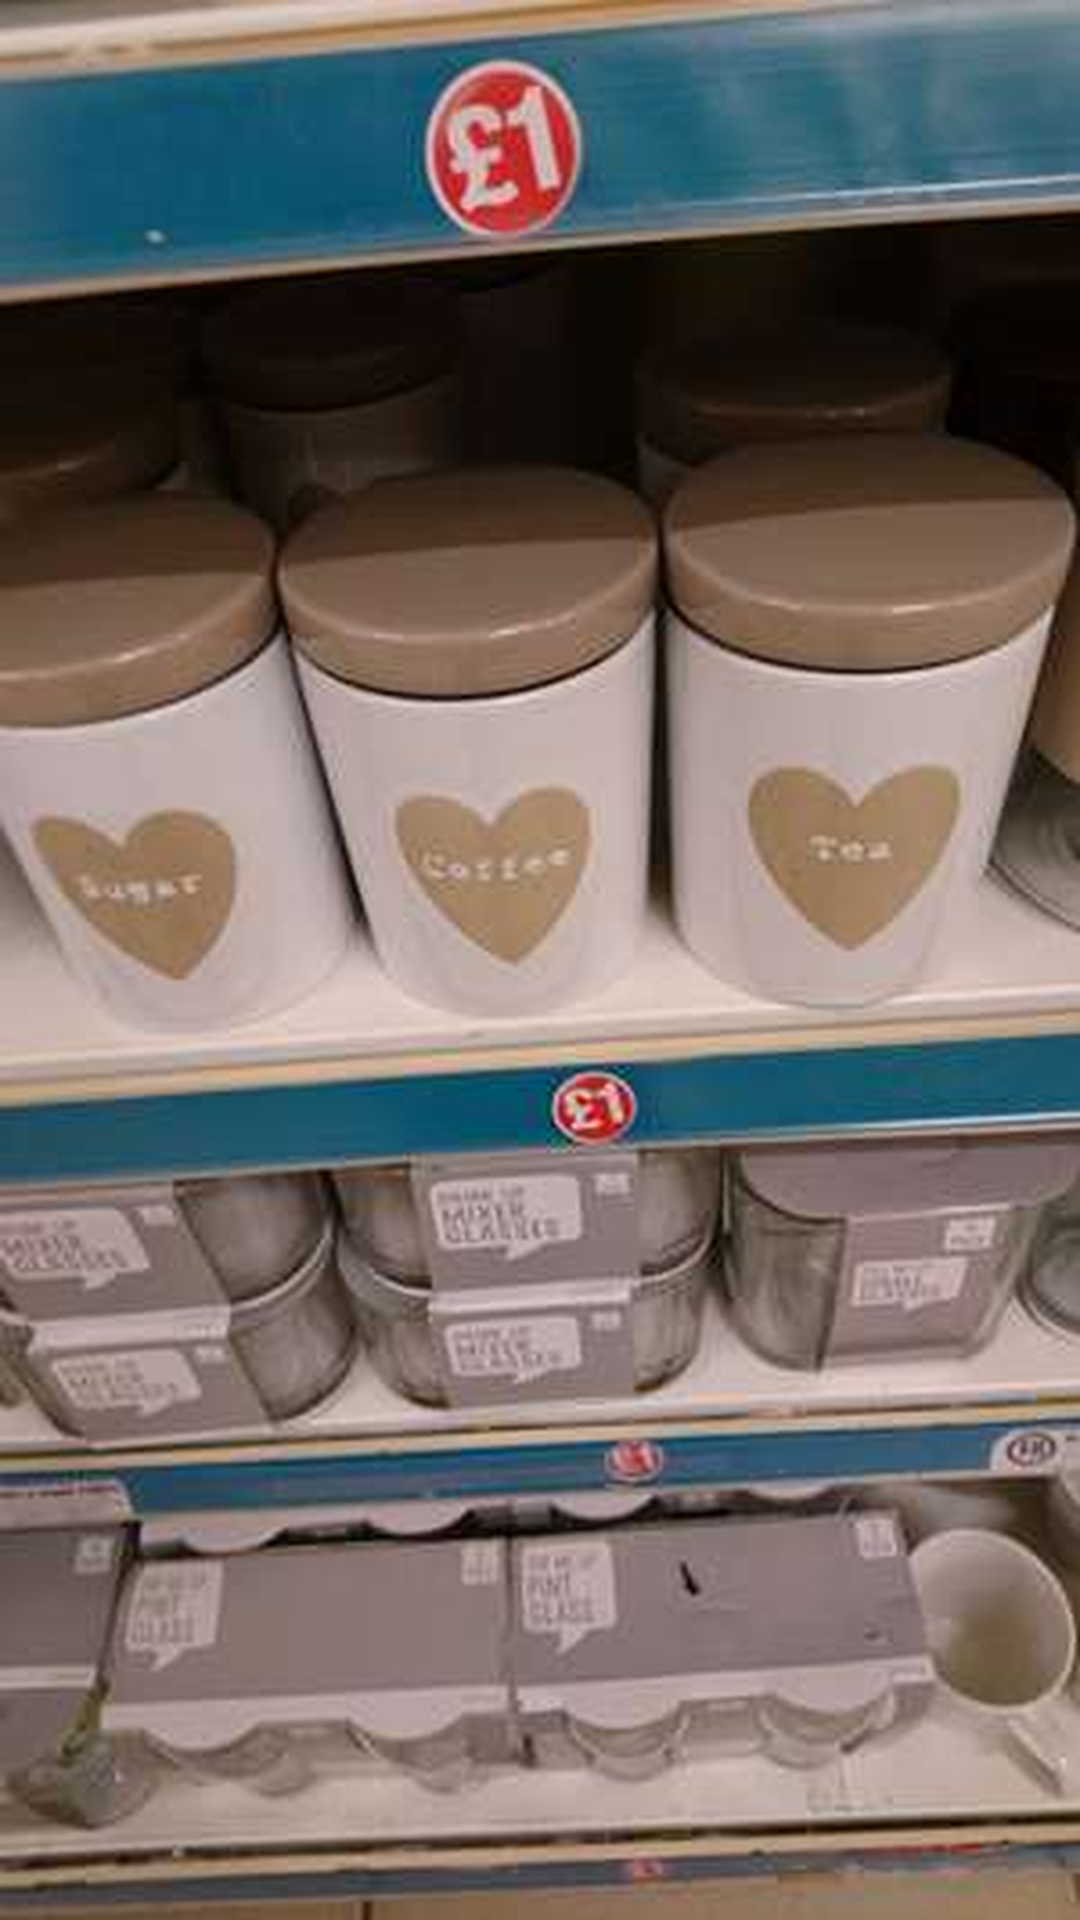 Tea coffee and sugar canisters £1 @ poundland